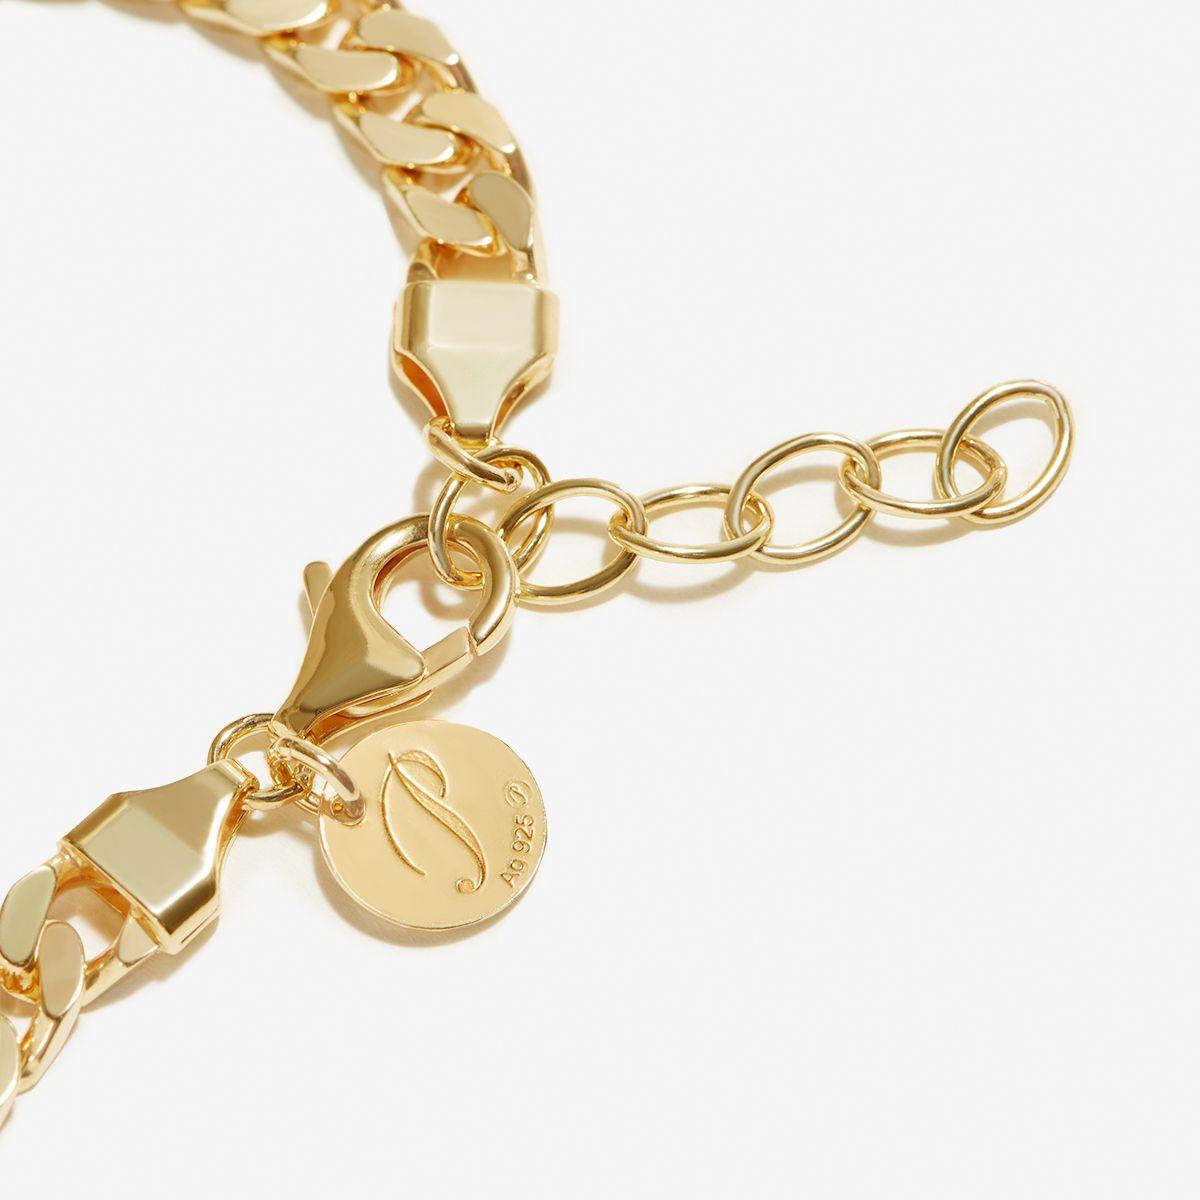 Polly - Armband - 18k vergoldet